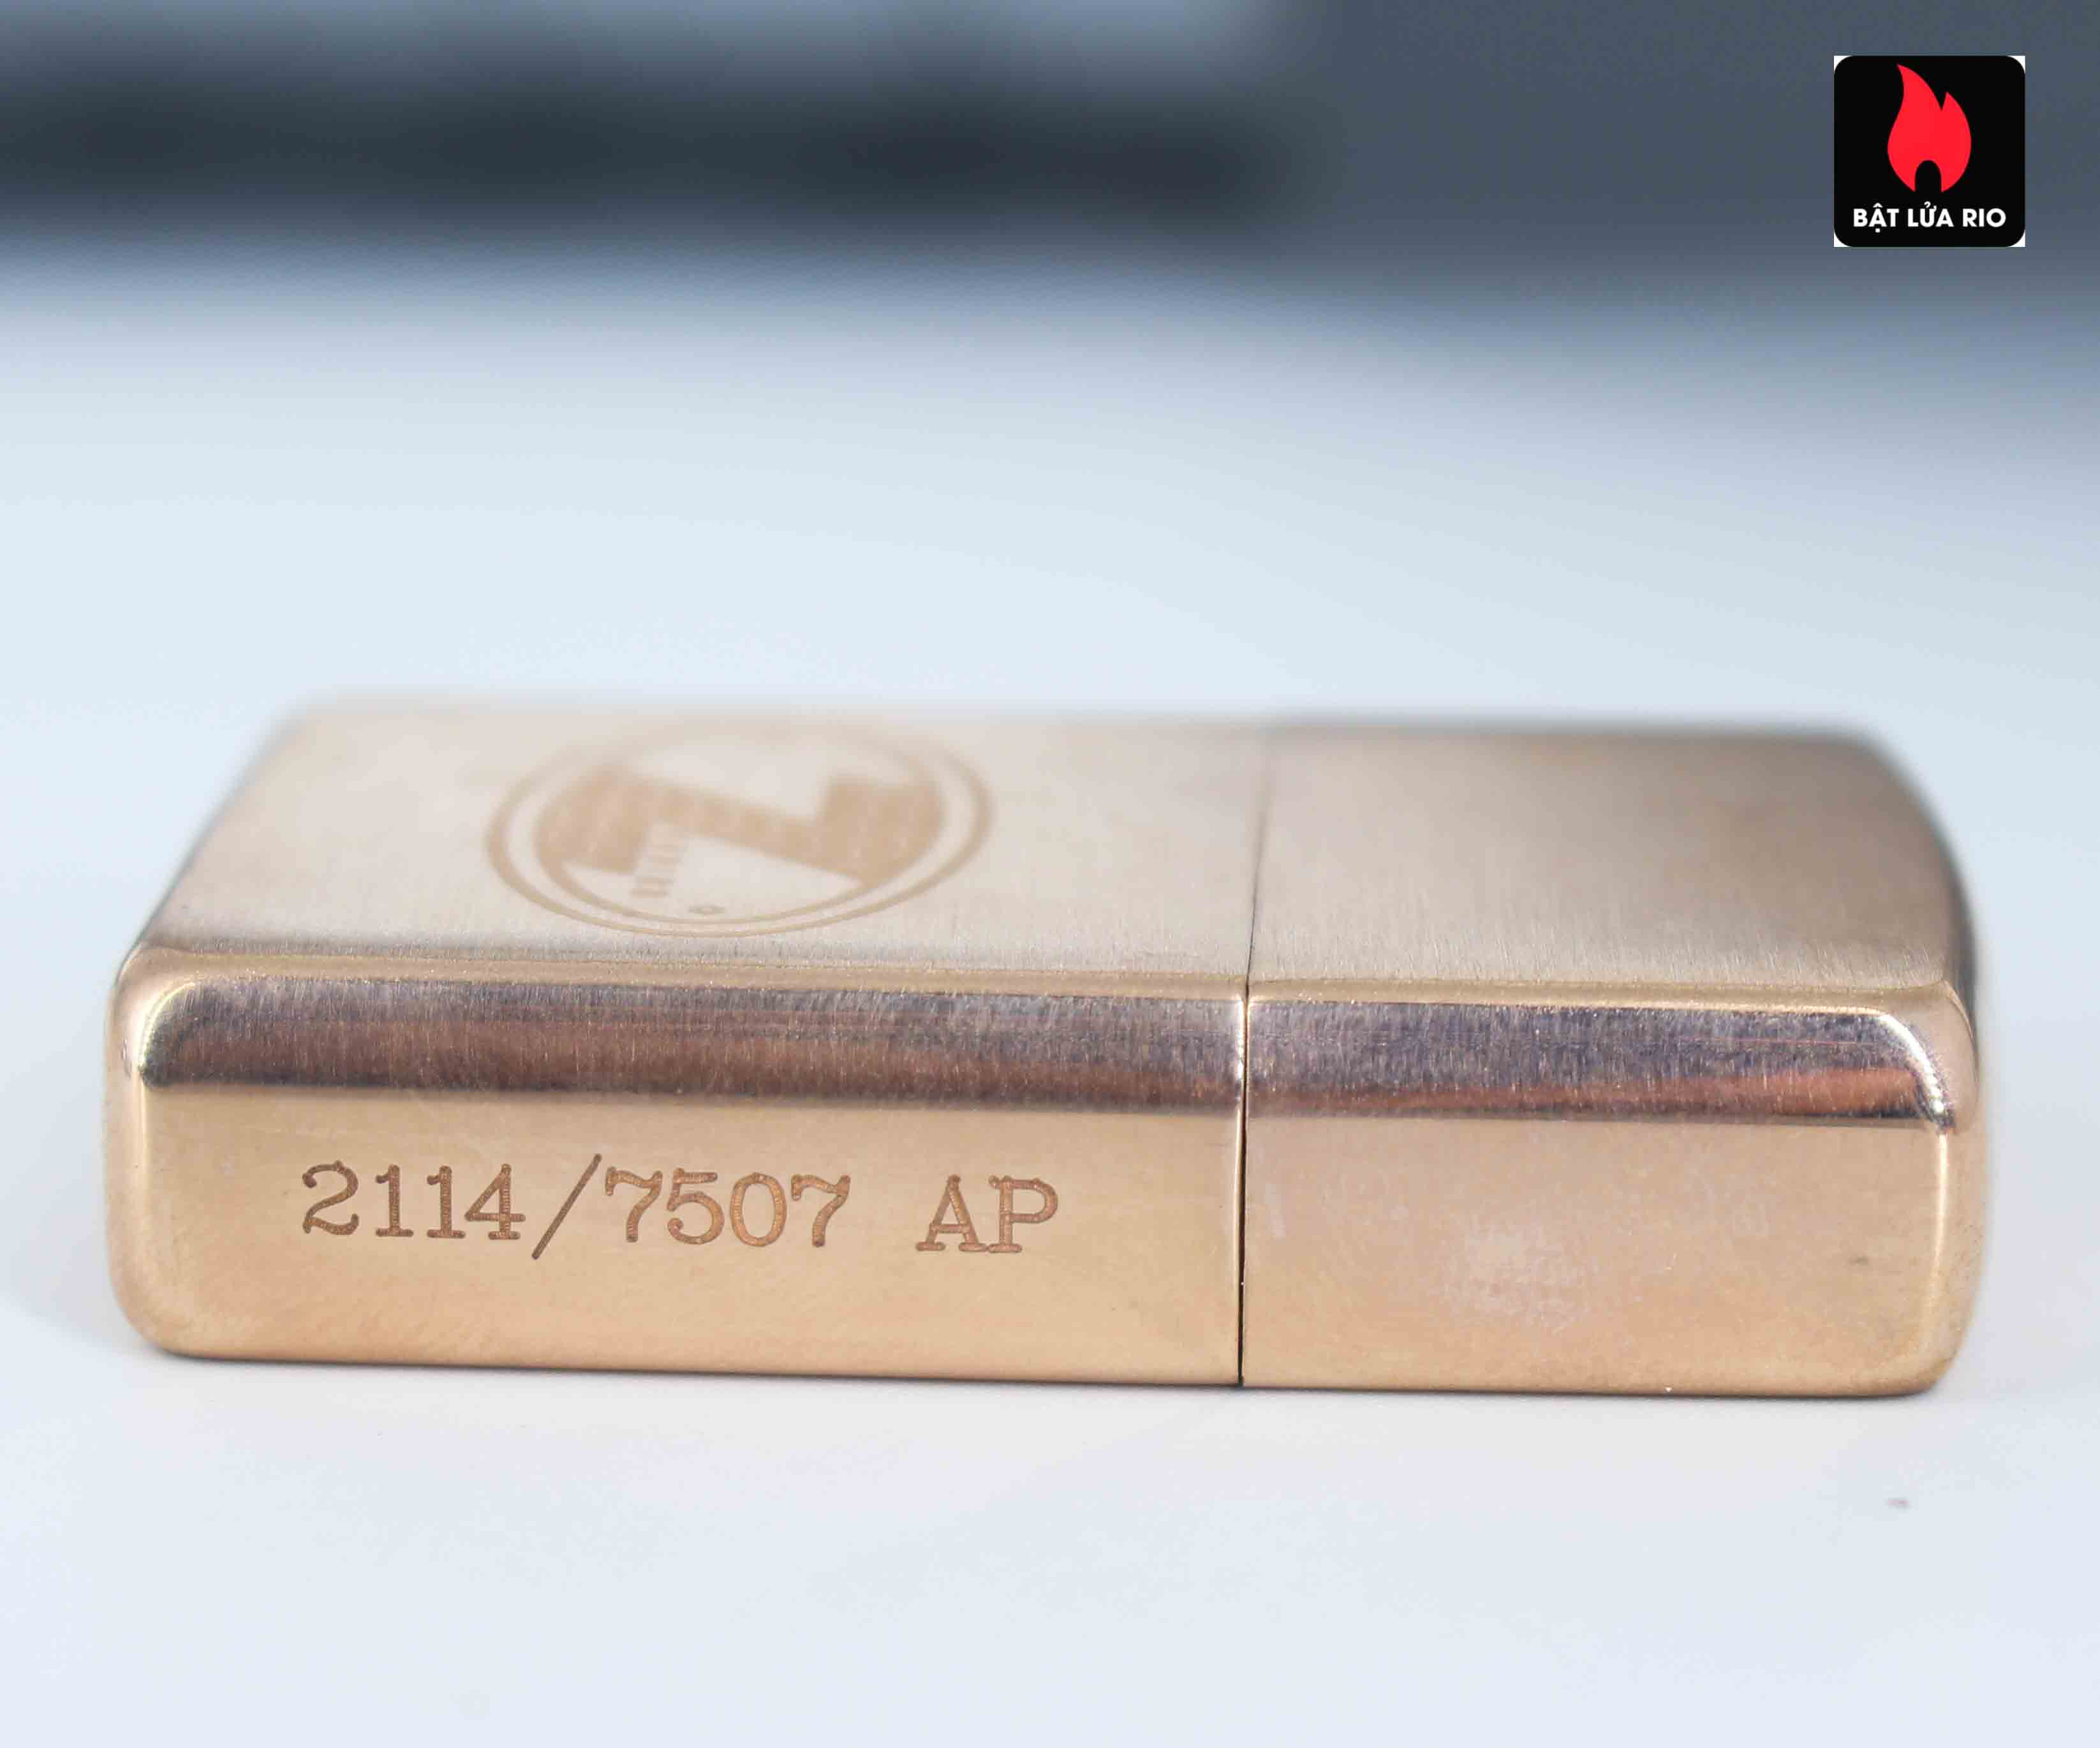 Zippo 2002 – Zippo Z-Series Copper Project – Asia - Limited 2114/7507 AP 4